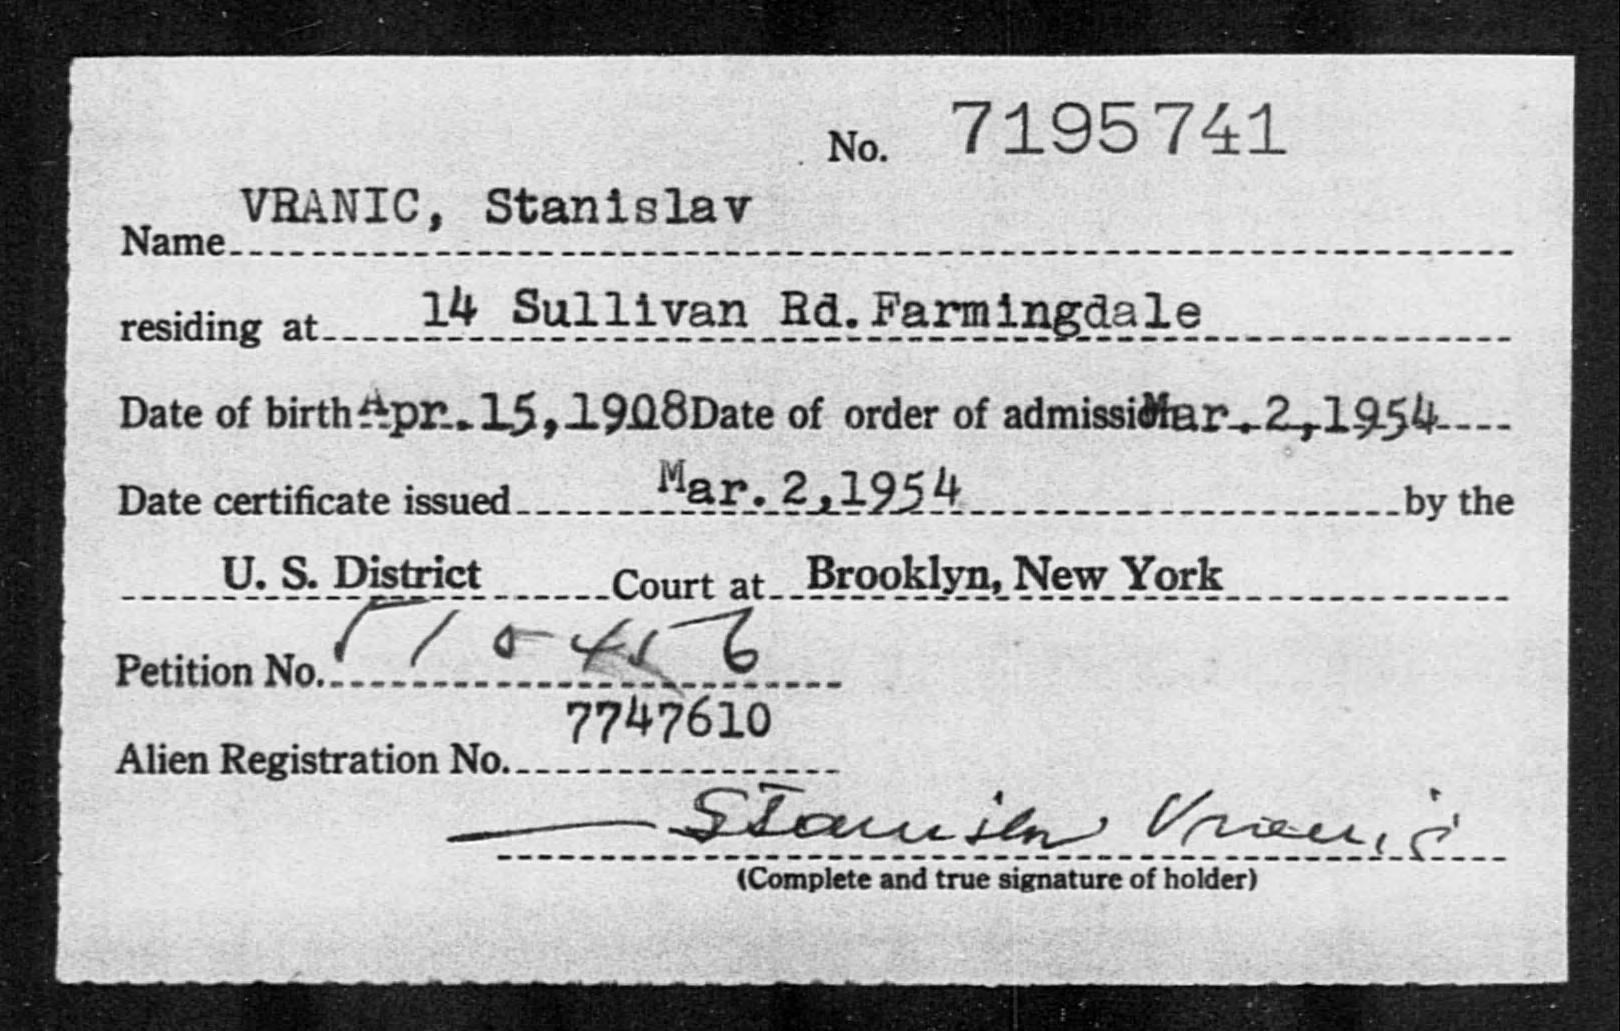 VRANIC, Stanislav - Born: 1908, Naturalized: 1954